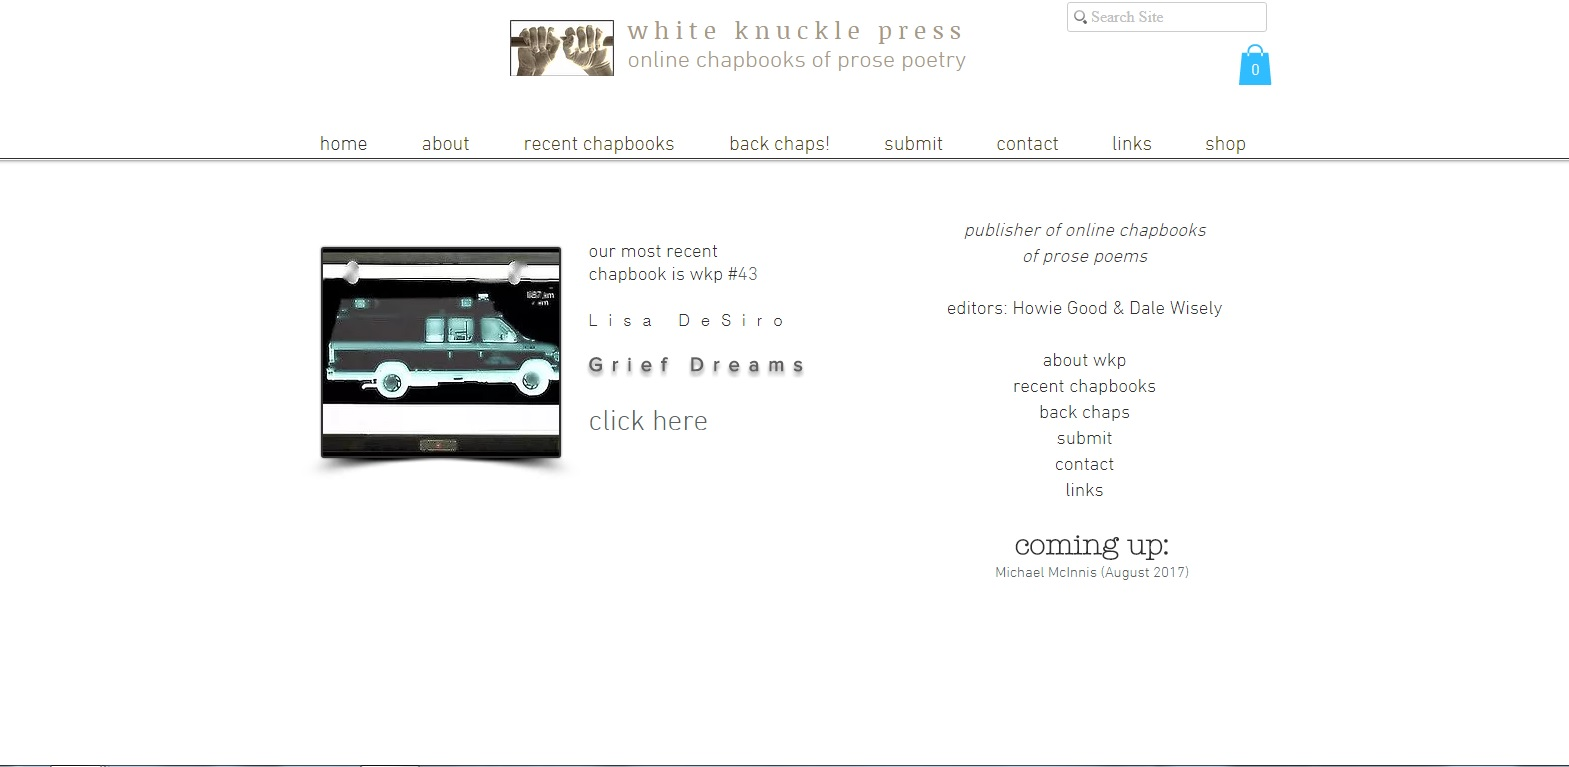 White Knuckle Press